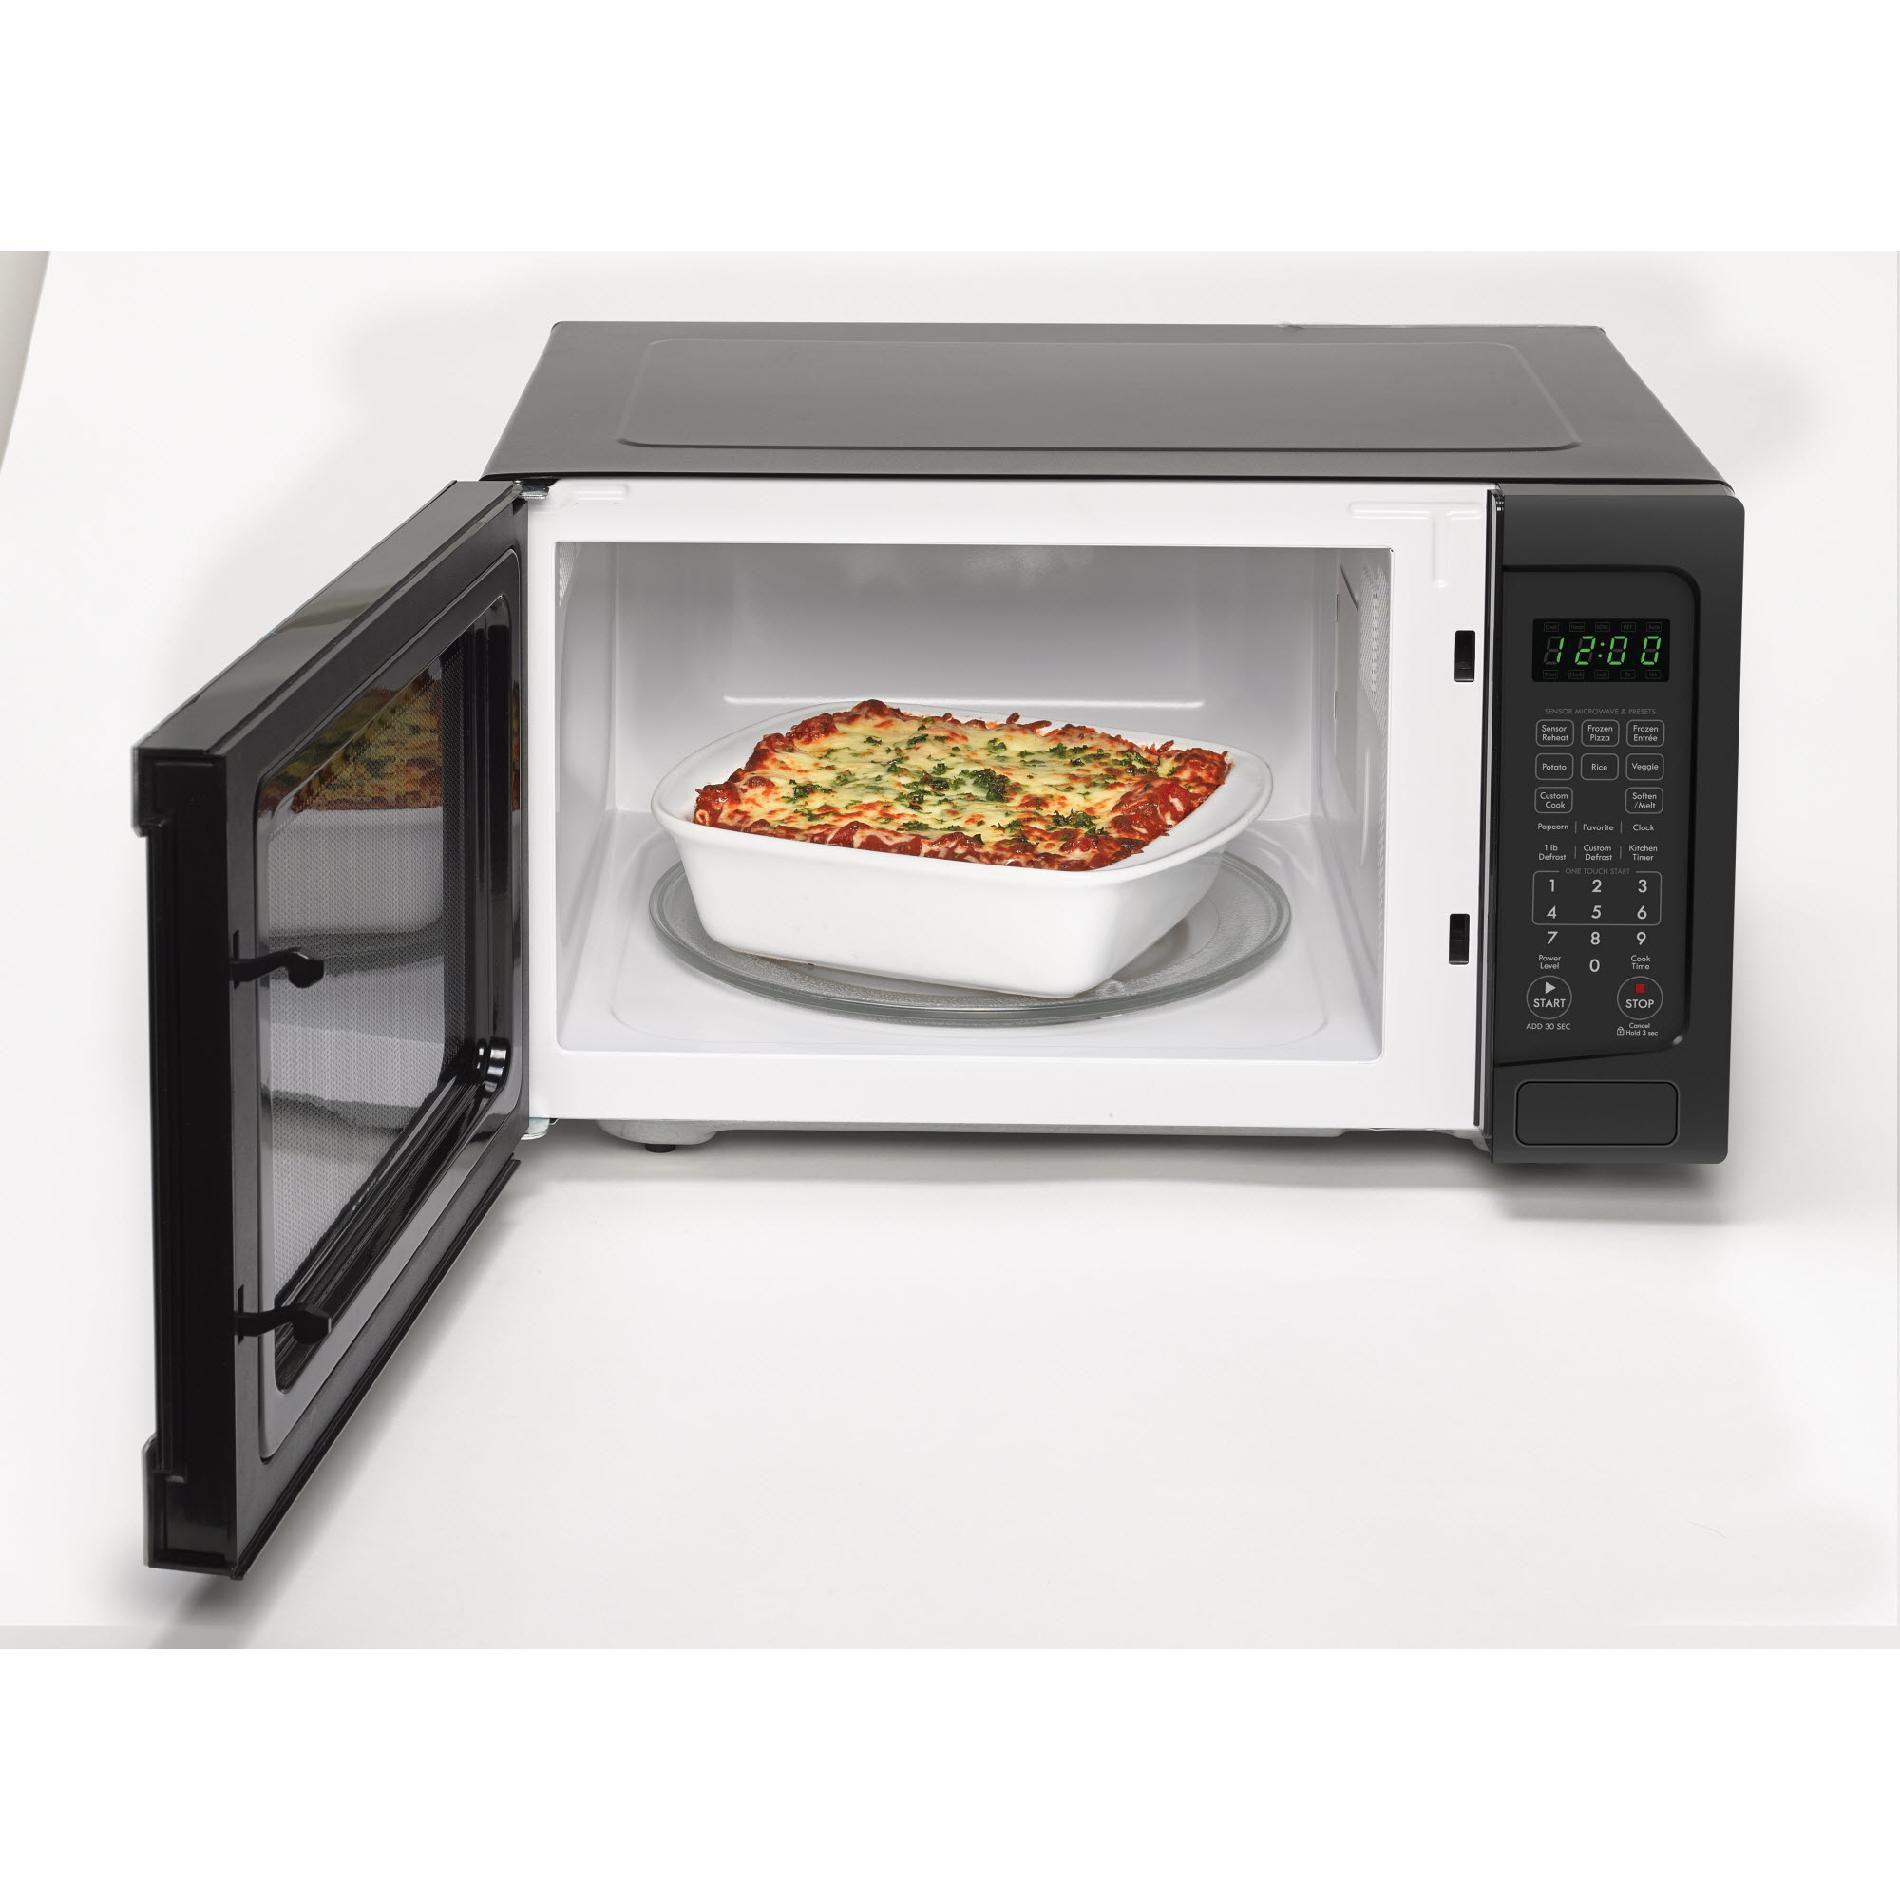 Kenmore 73169 1.6  cu. ft. Countertop Microwave - Black